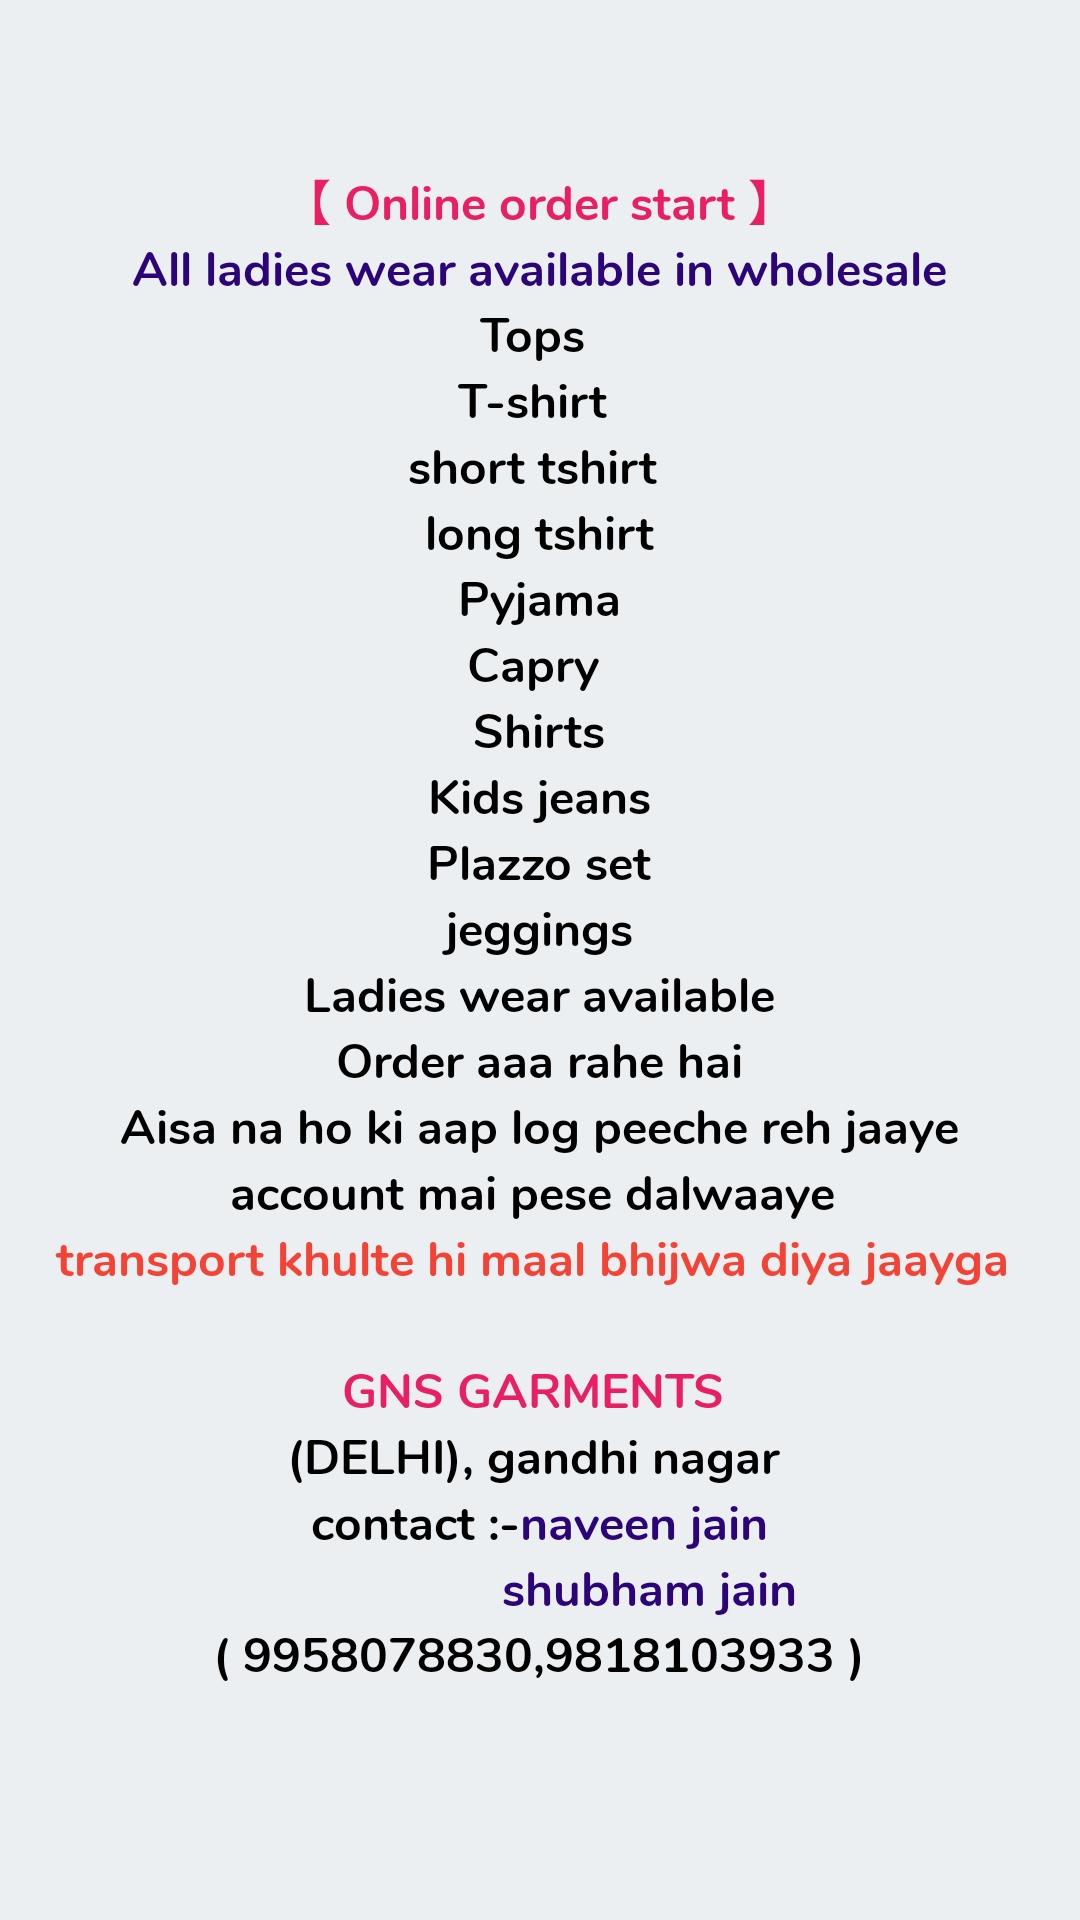 【 Online order start 】 All ladies wear available in wholesale Tops  T-shirt  short tshirt  long tshirt Pyjama Capry  Shirts Kids jeans Plazzo set jeggings Ladies wear available Order aaa rahe hai Aisa na ho ki aap log peeche reh jaaye account mai pese dalwaaye  transport khulte hi maal bhijwa diya jaayga   GNS GARMENTS  (DELHI), gandhi nagar  contact :-naveen jain                  shubham jain ( 9958078830,9818103933 )